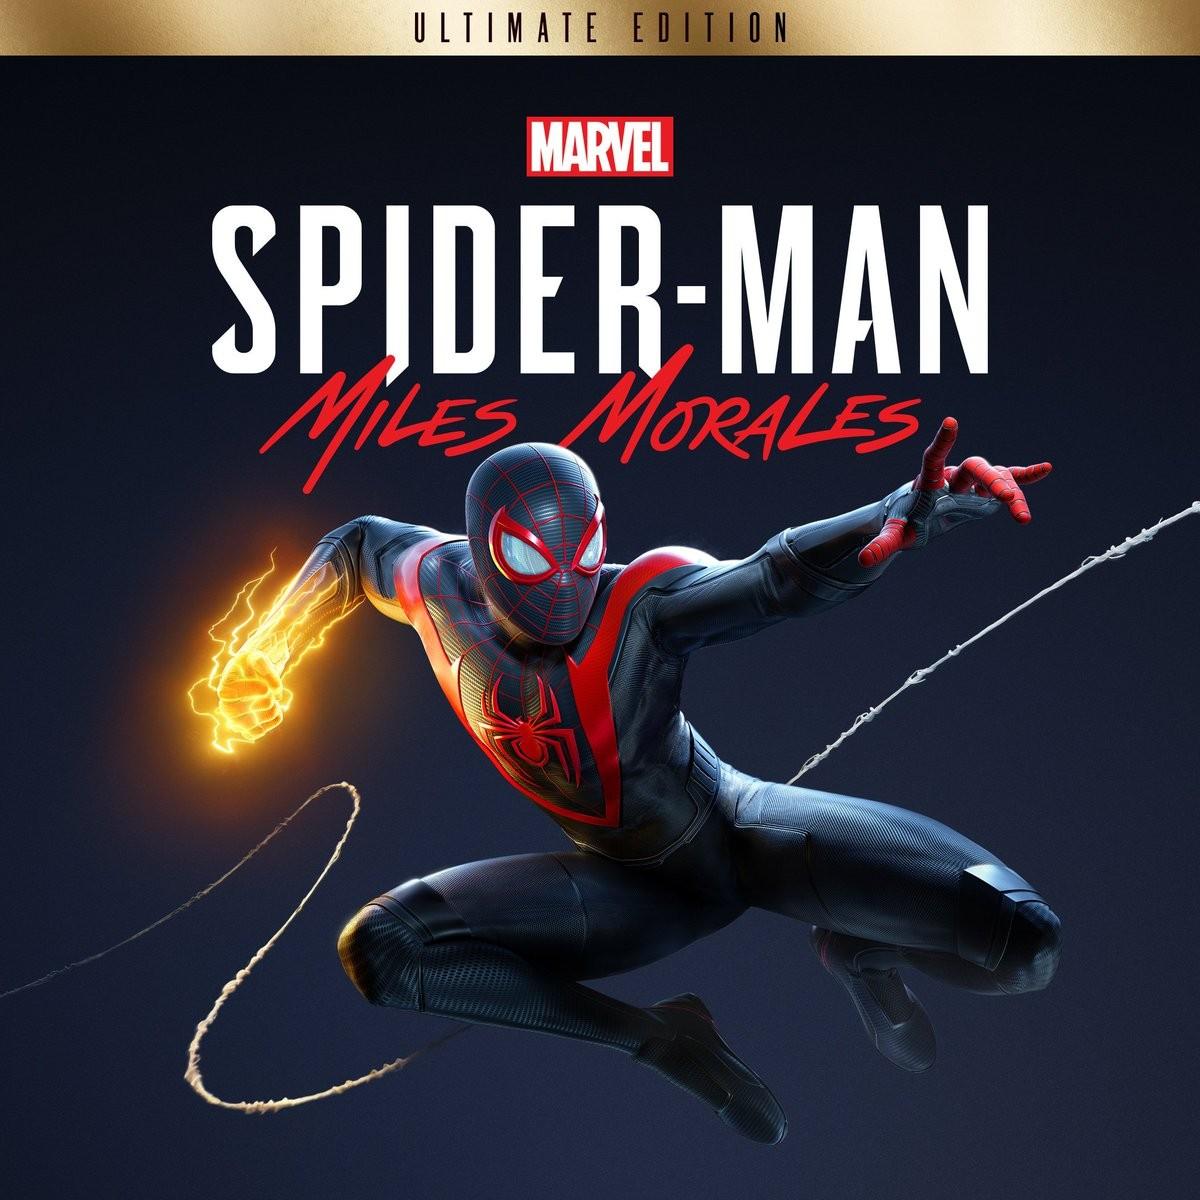 Прокат Marvel's Spider-Man Miles Morales Ultimate Edition | Marvel's Людина-павук Майлз Моралес від 7 днів PS4